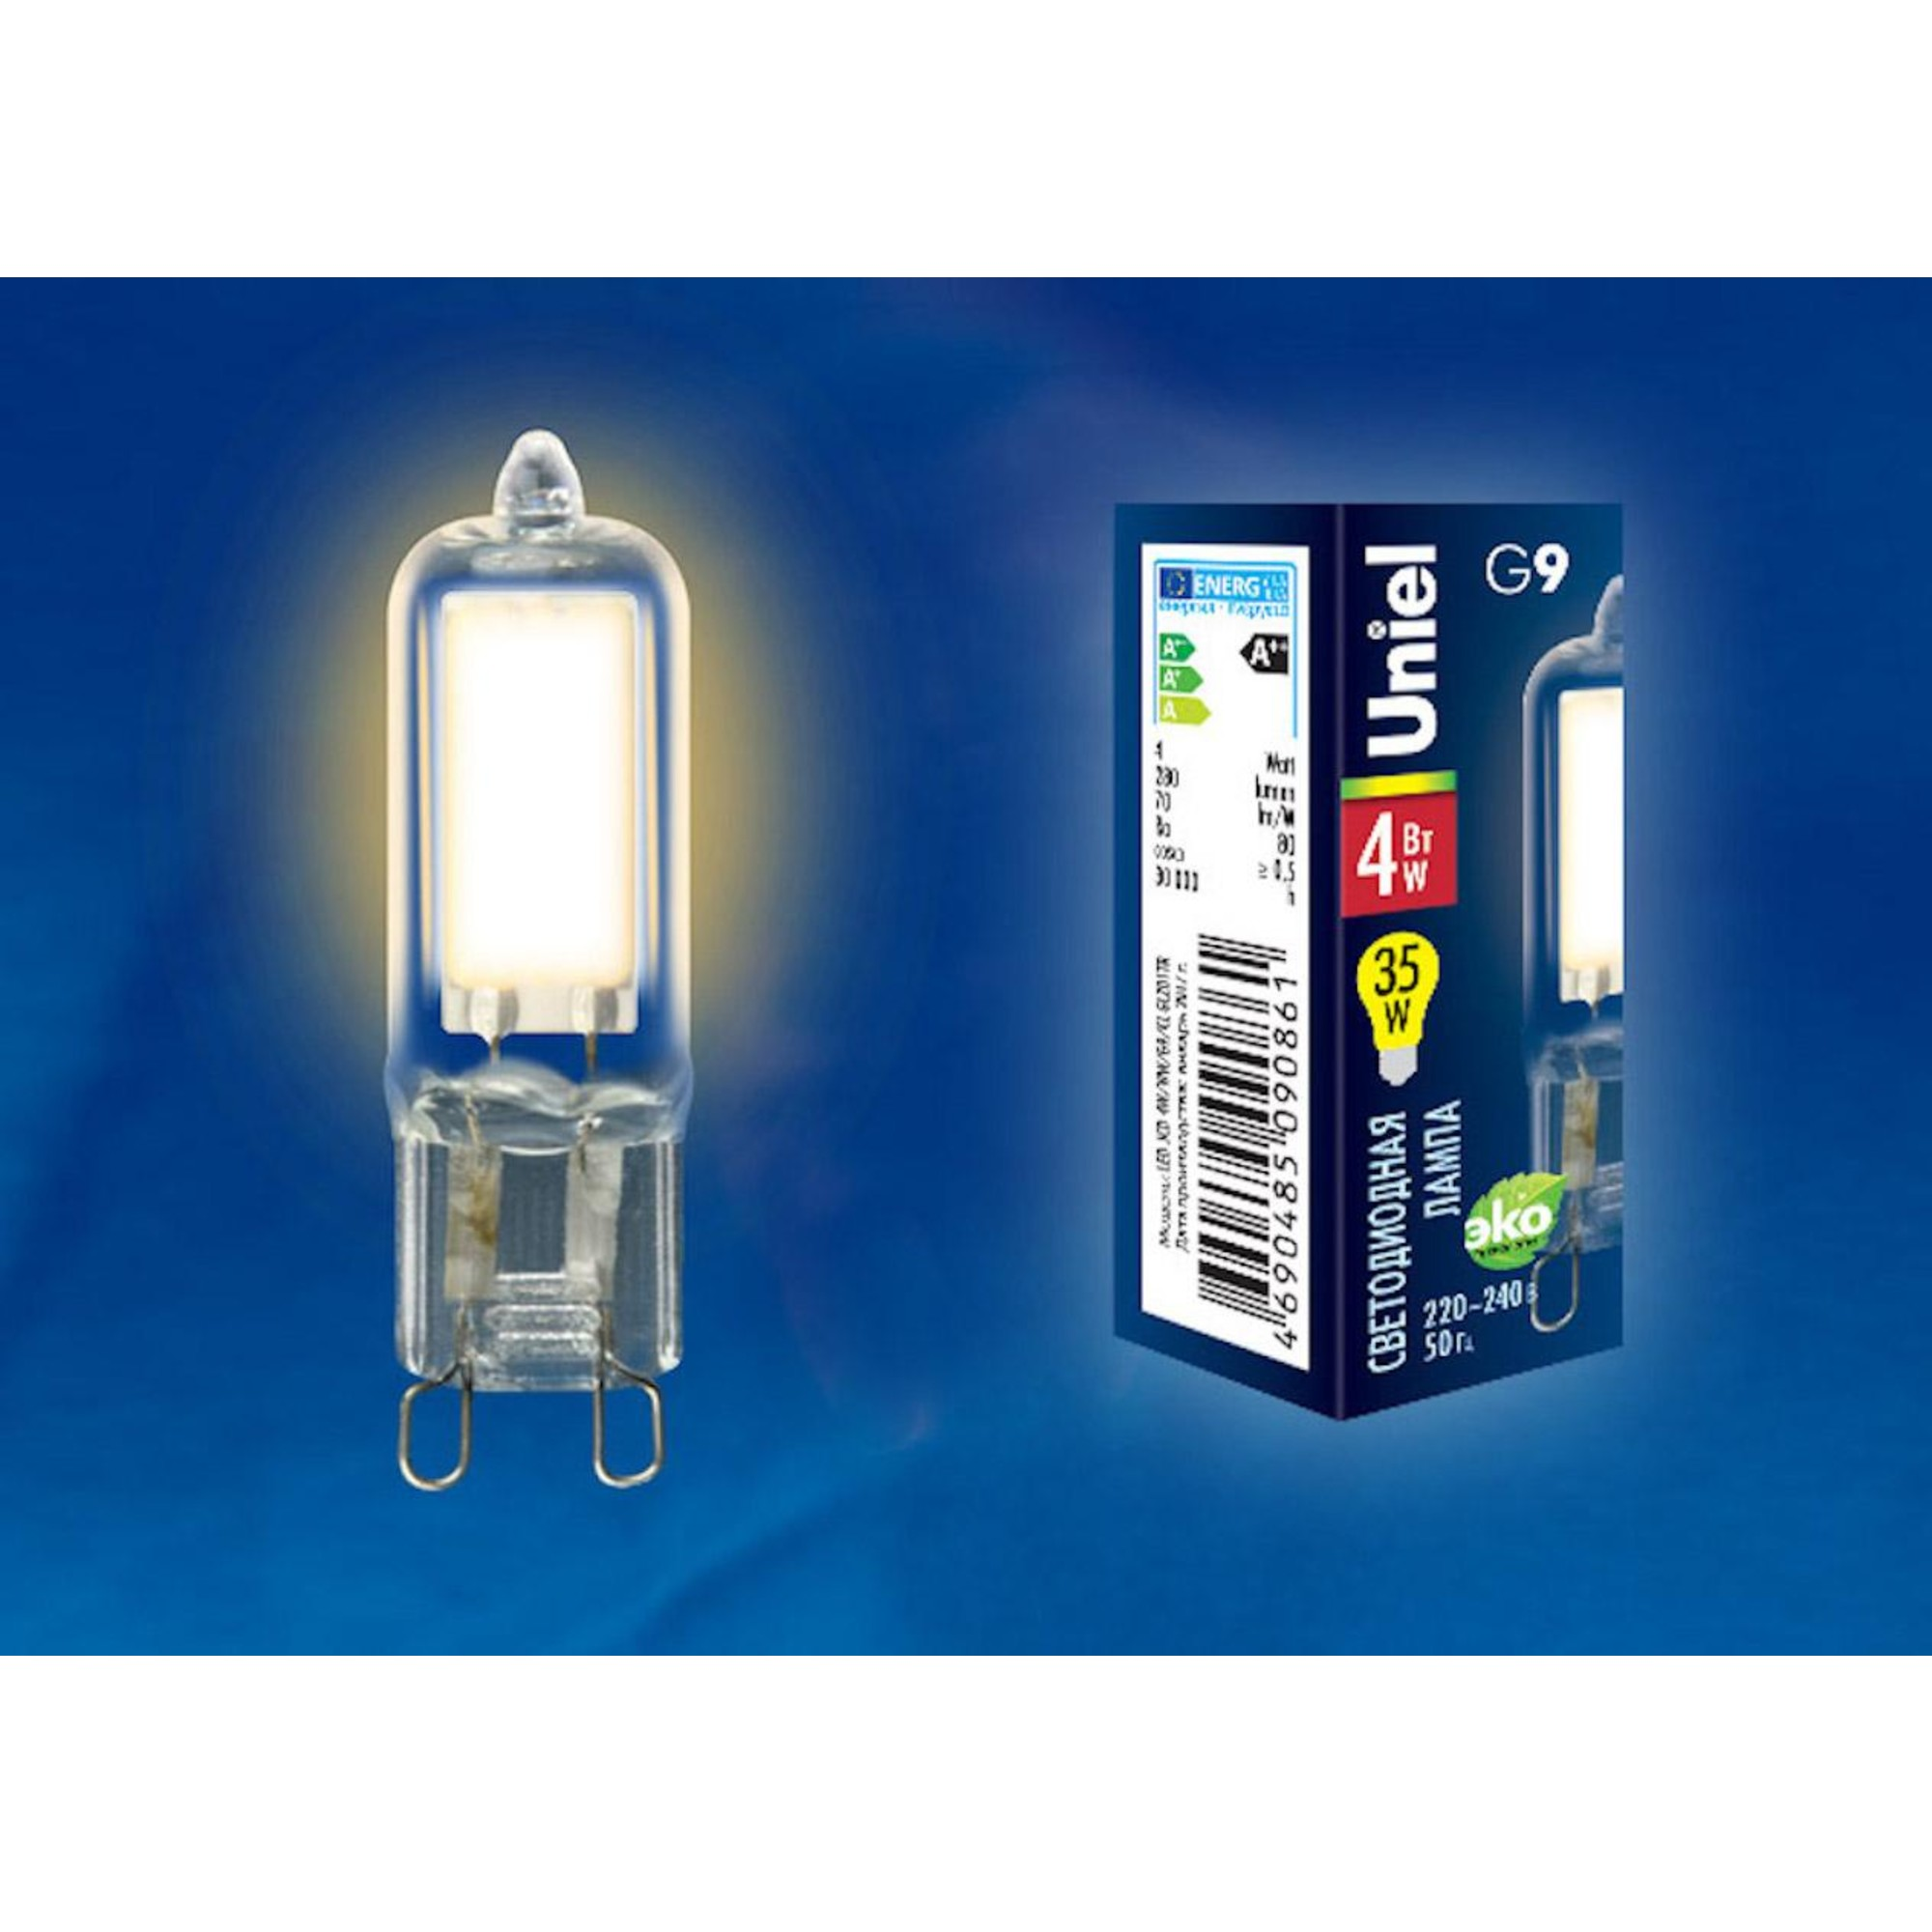 Лампа Volpe светодиодная G9 4 Вт теплый свет